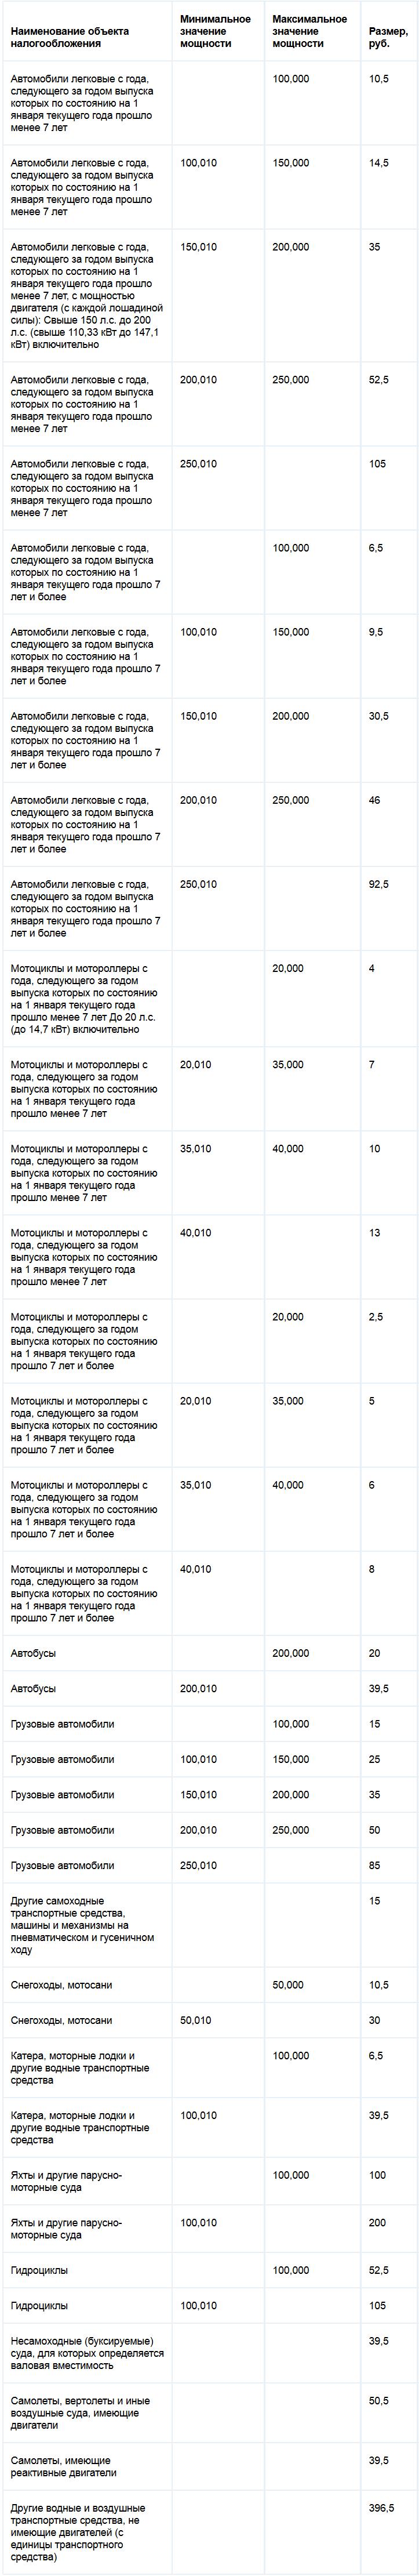 Ставки транспортного налога Иркутской области